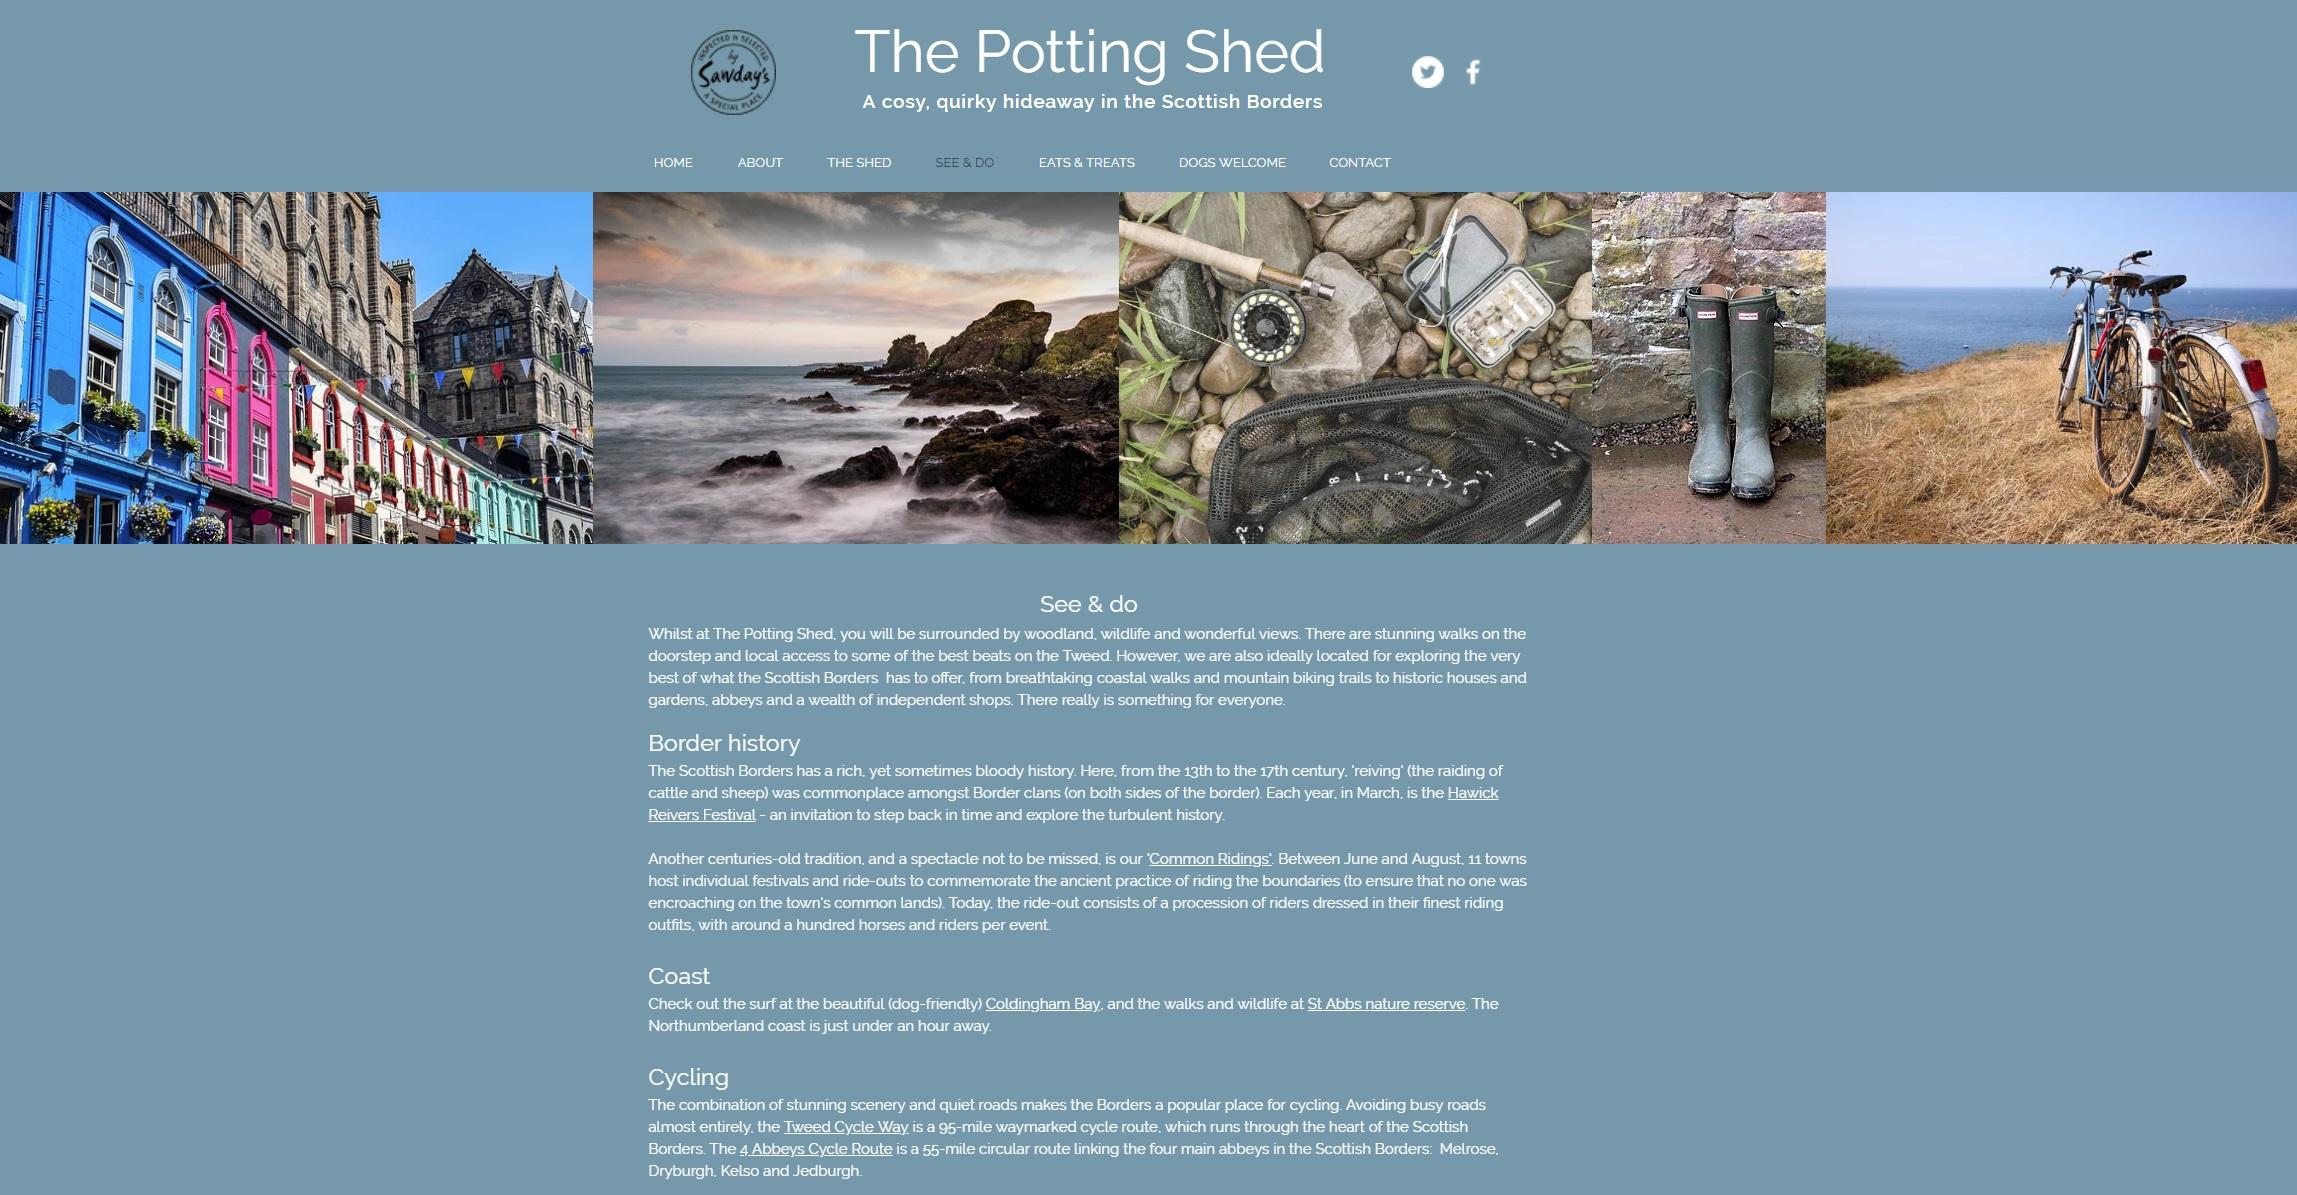 Website designed by Aspinall Ink